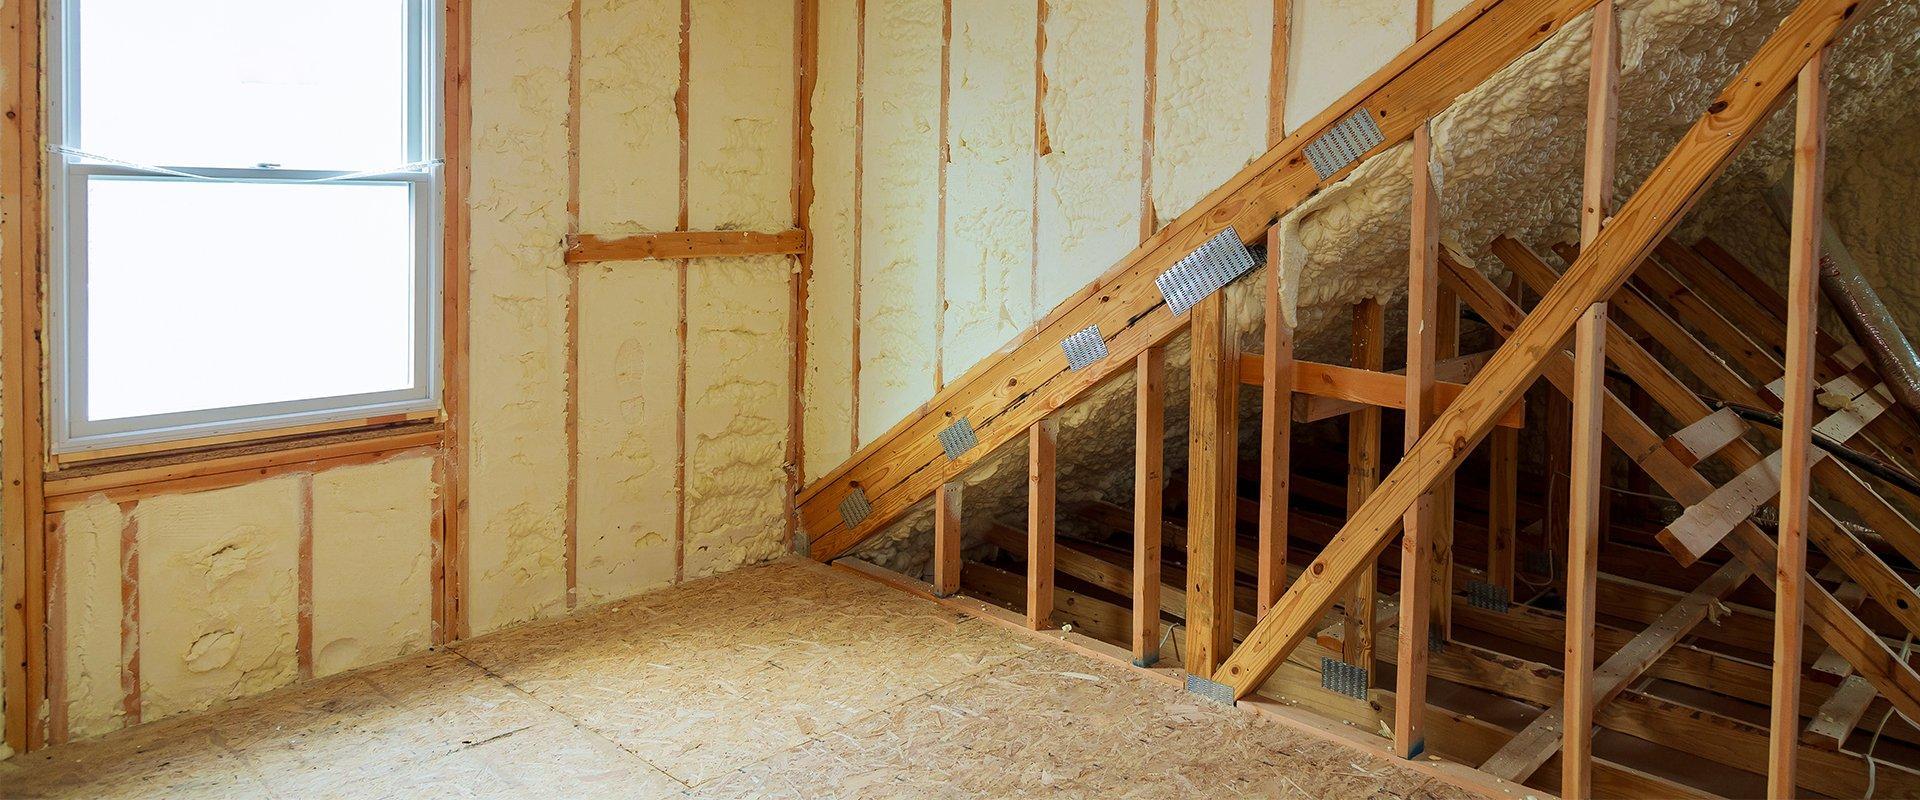 spray foam insulation in a washington state home